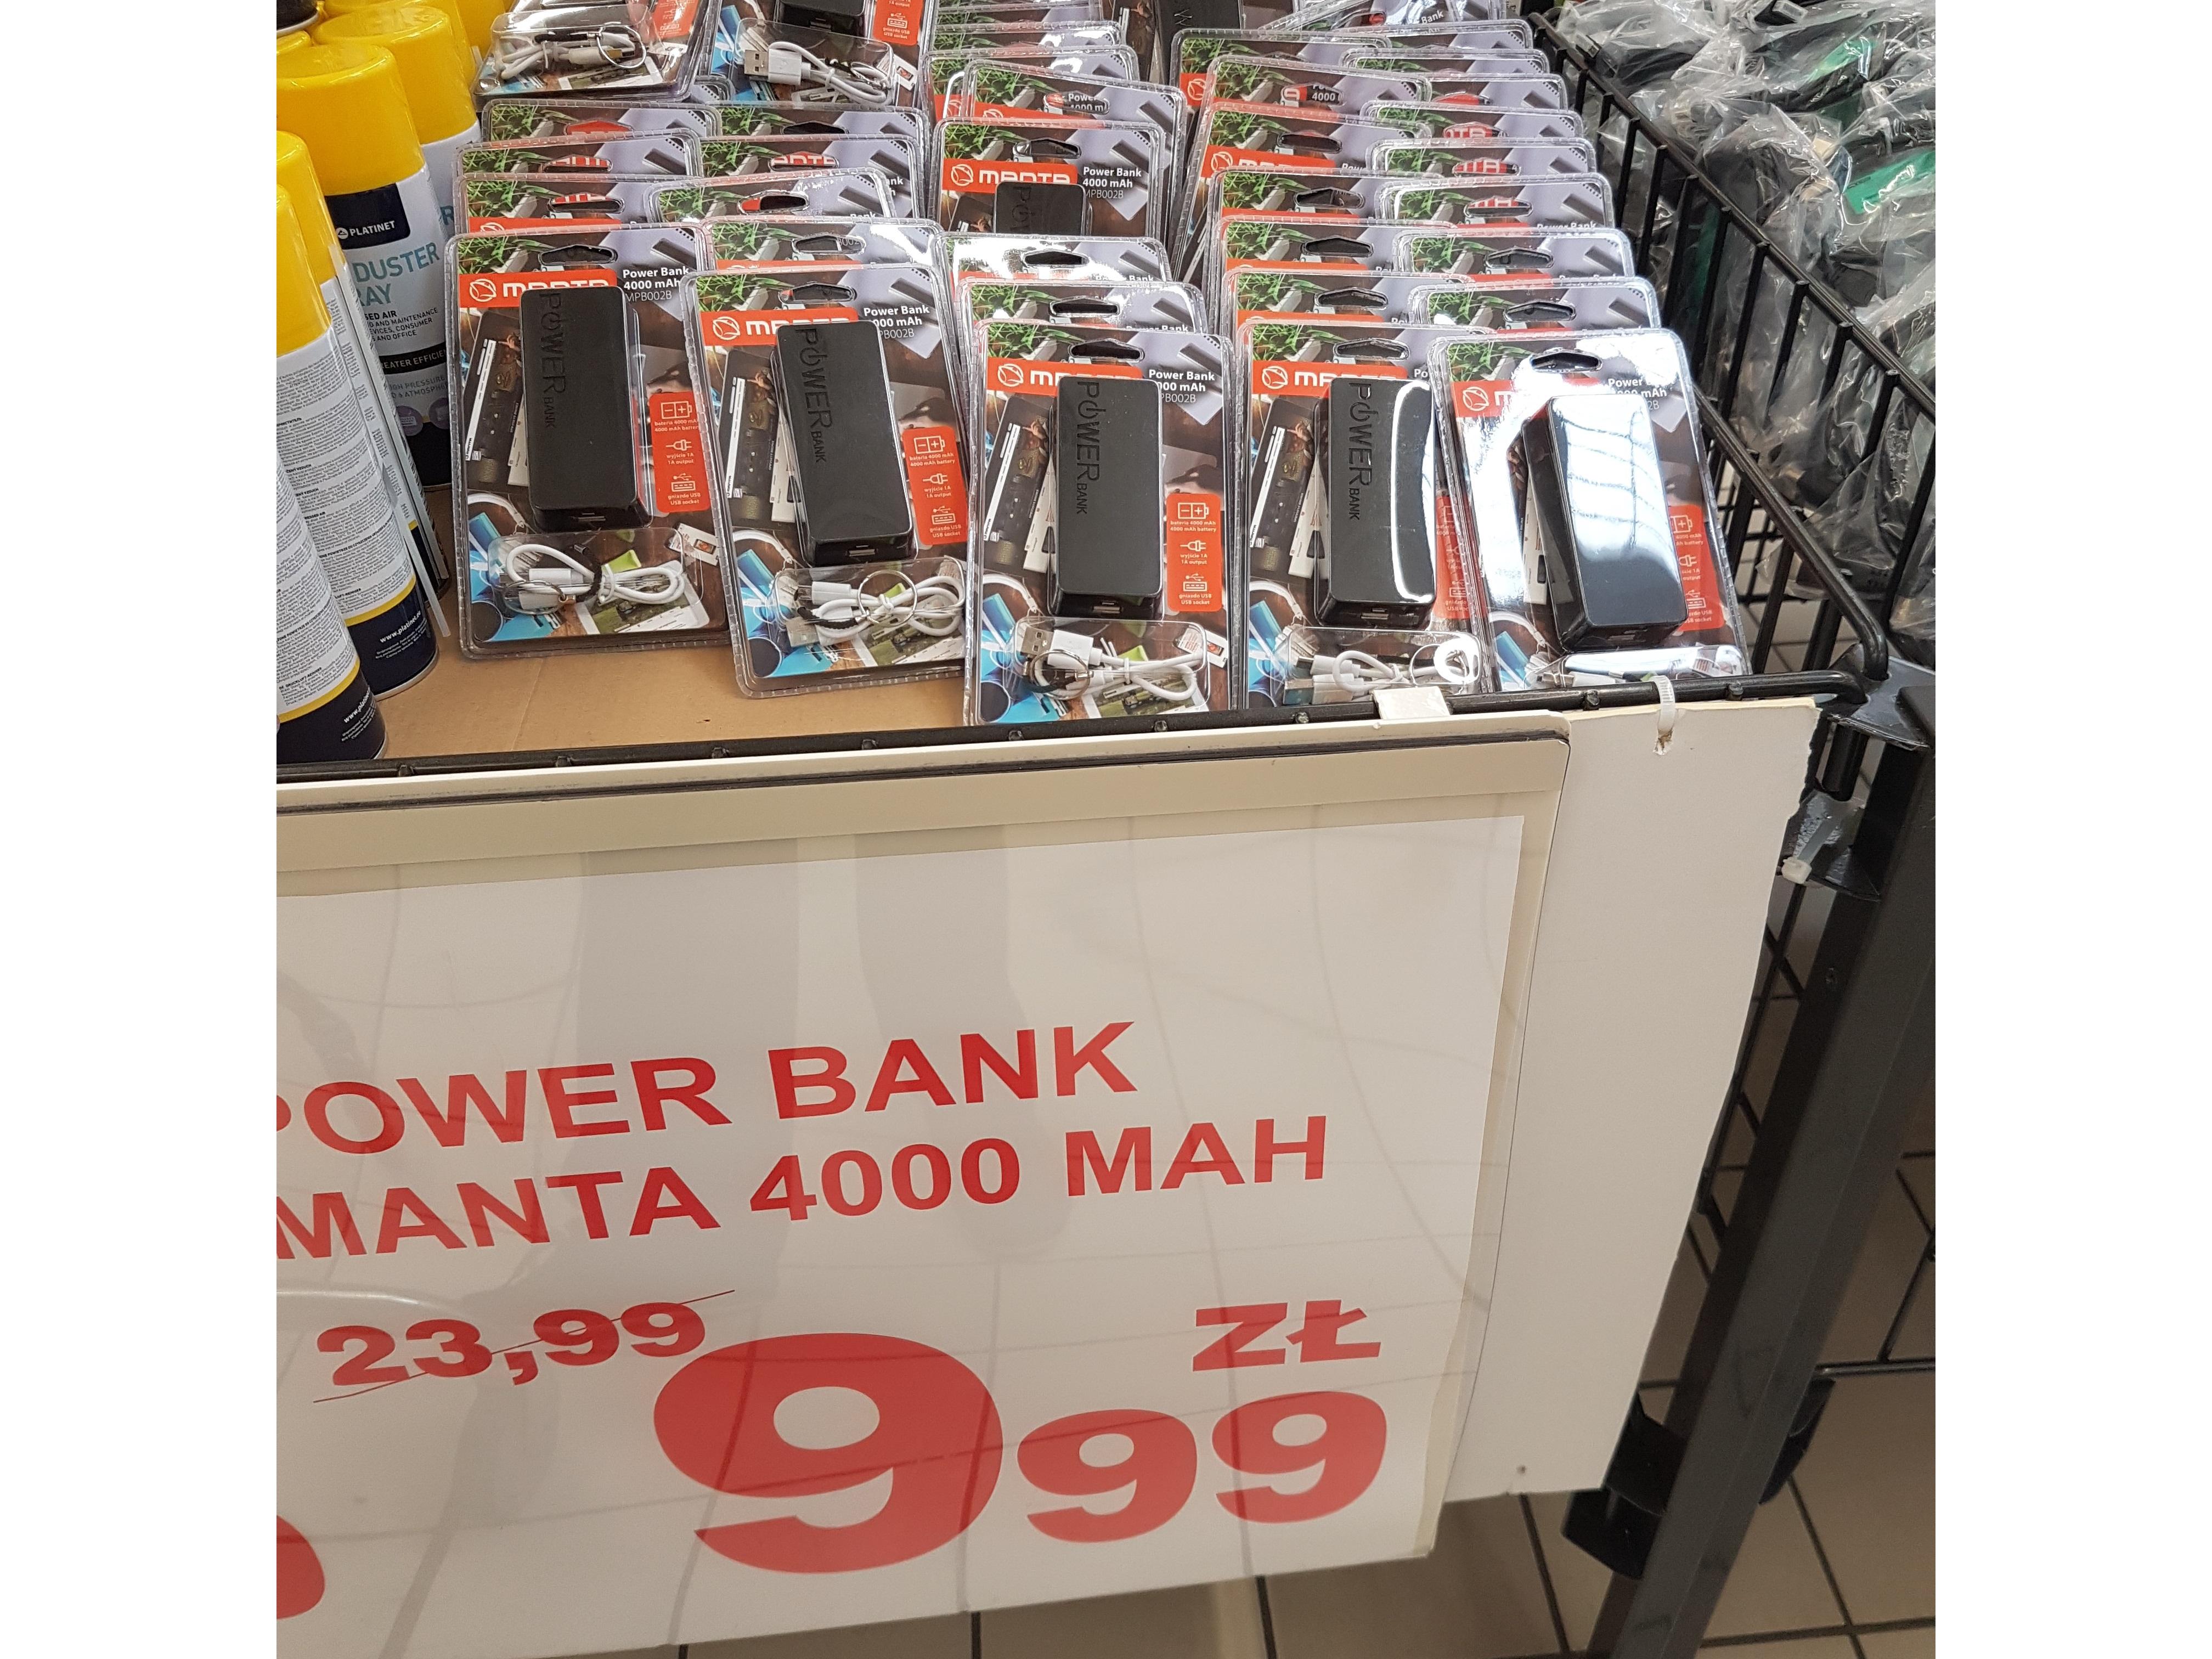 POWER BANK 4000 mAh za dychę